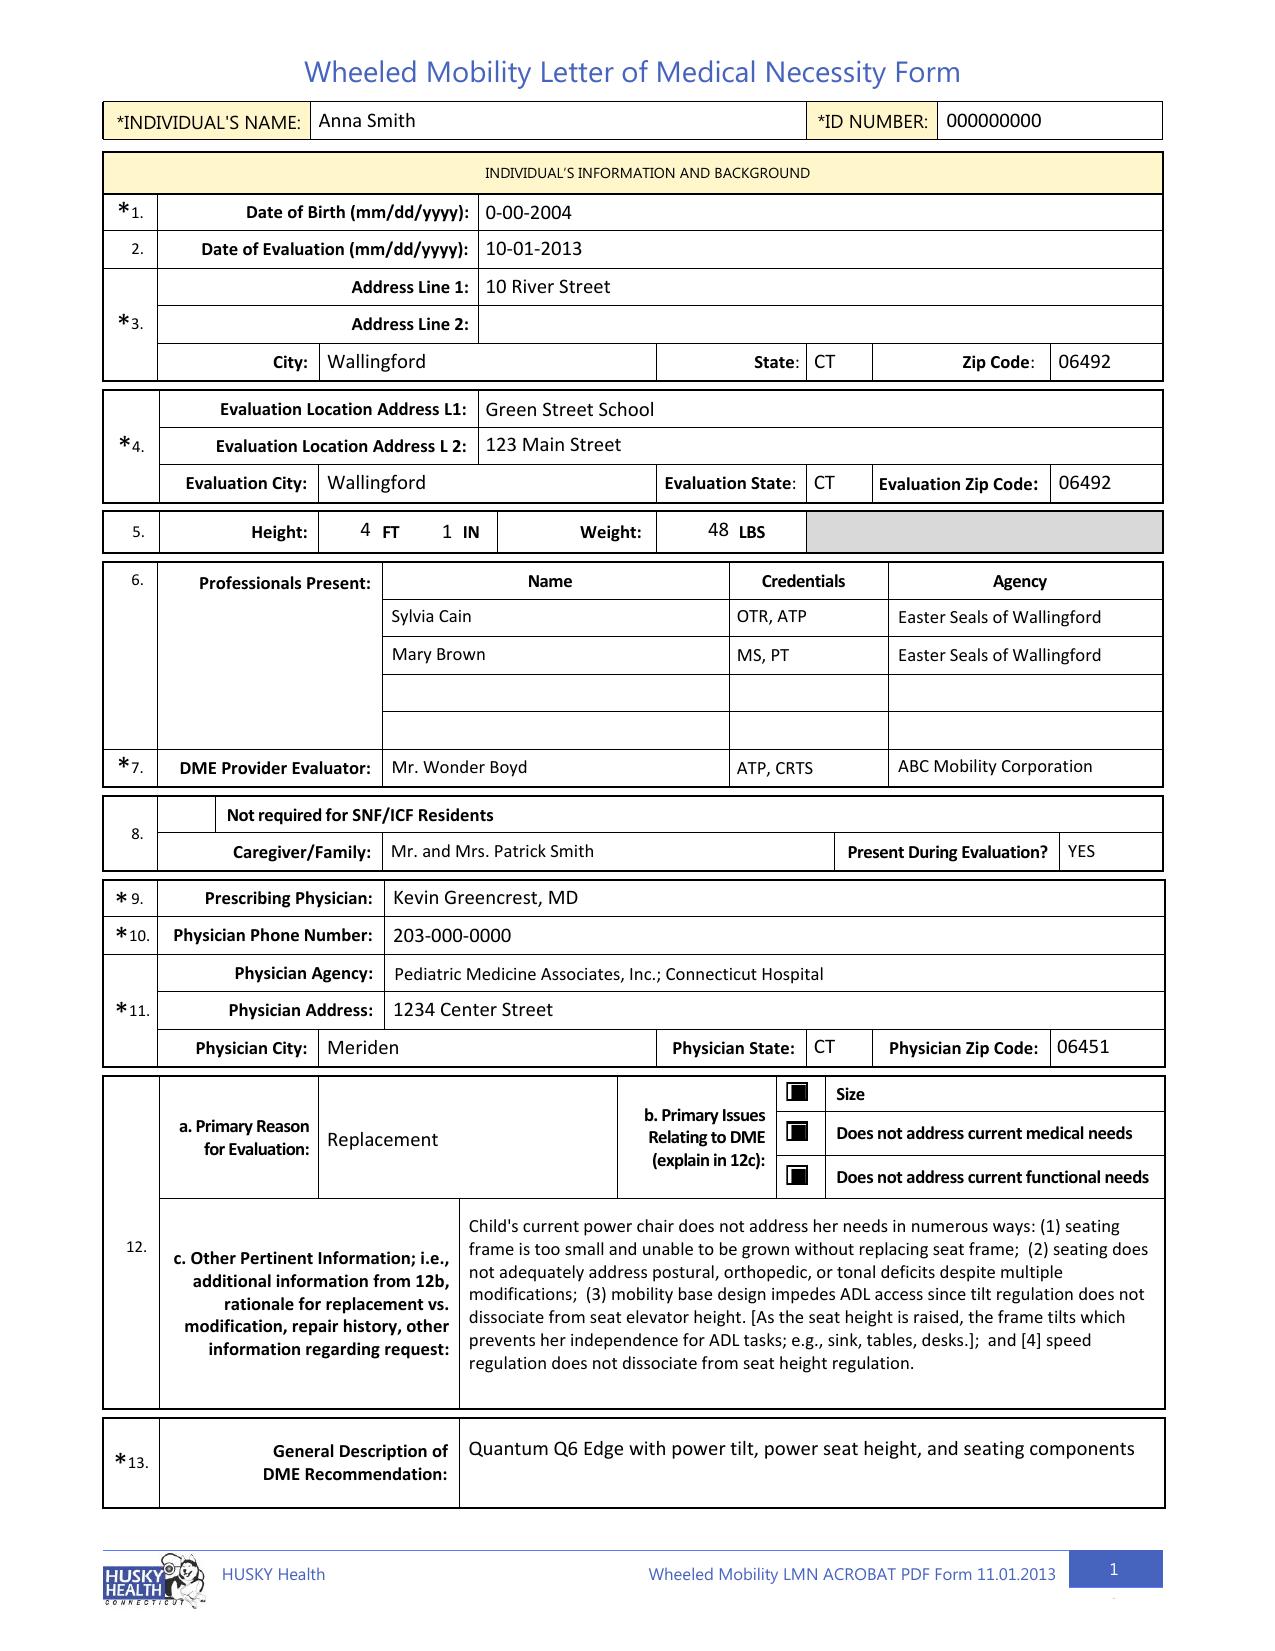 Sample LMN Form for a Living at Home Child | manualzz com